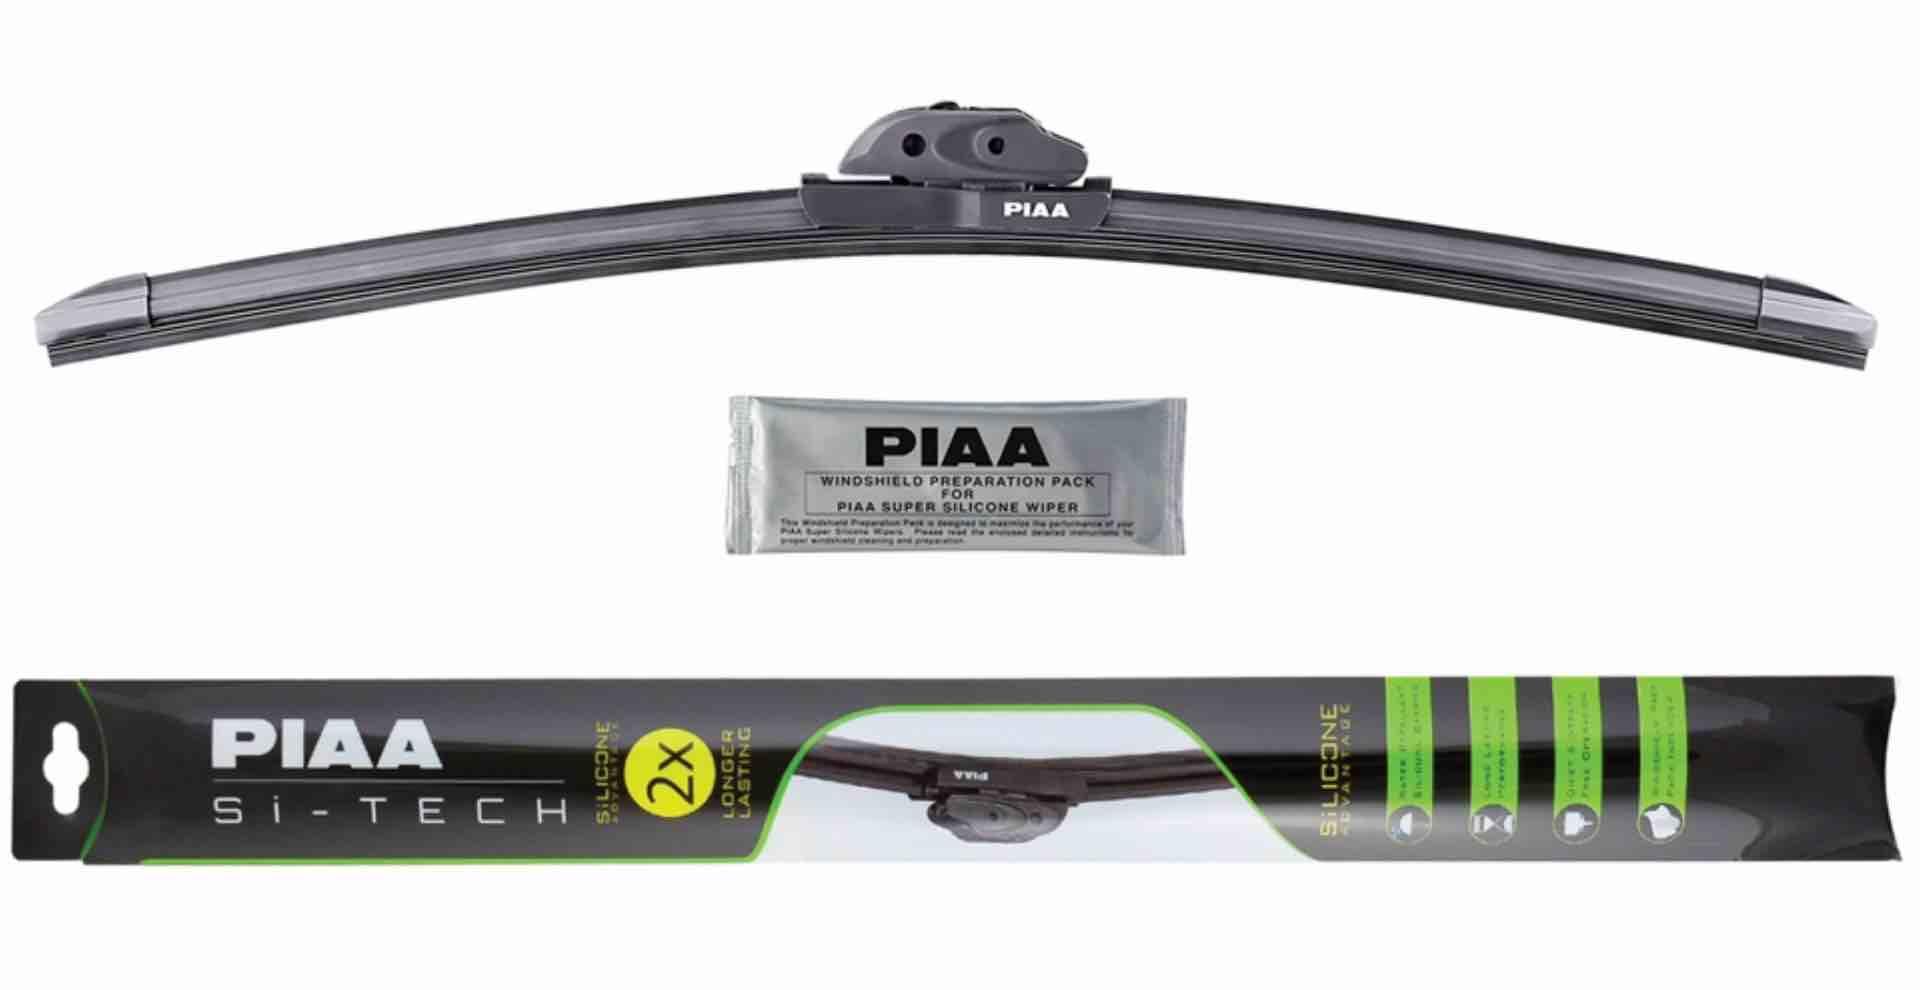 piaa-si-tech-silicone-windshield-wipers